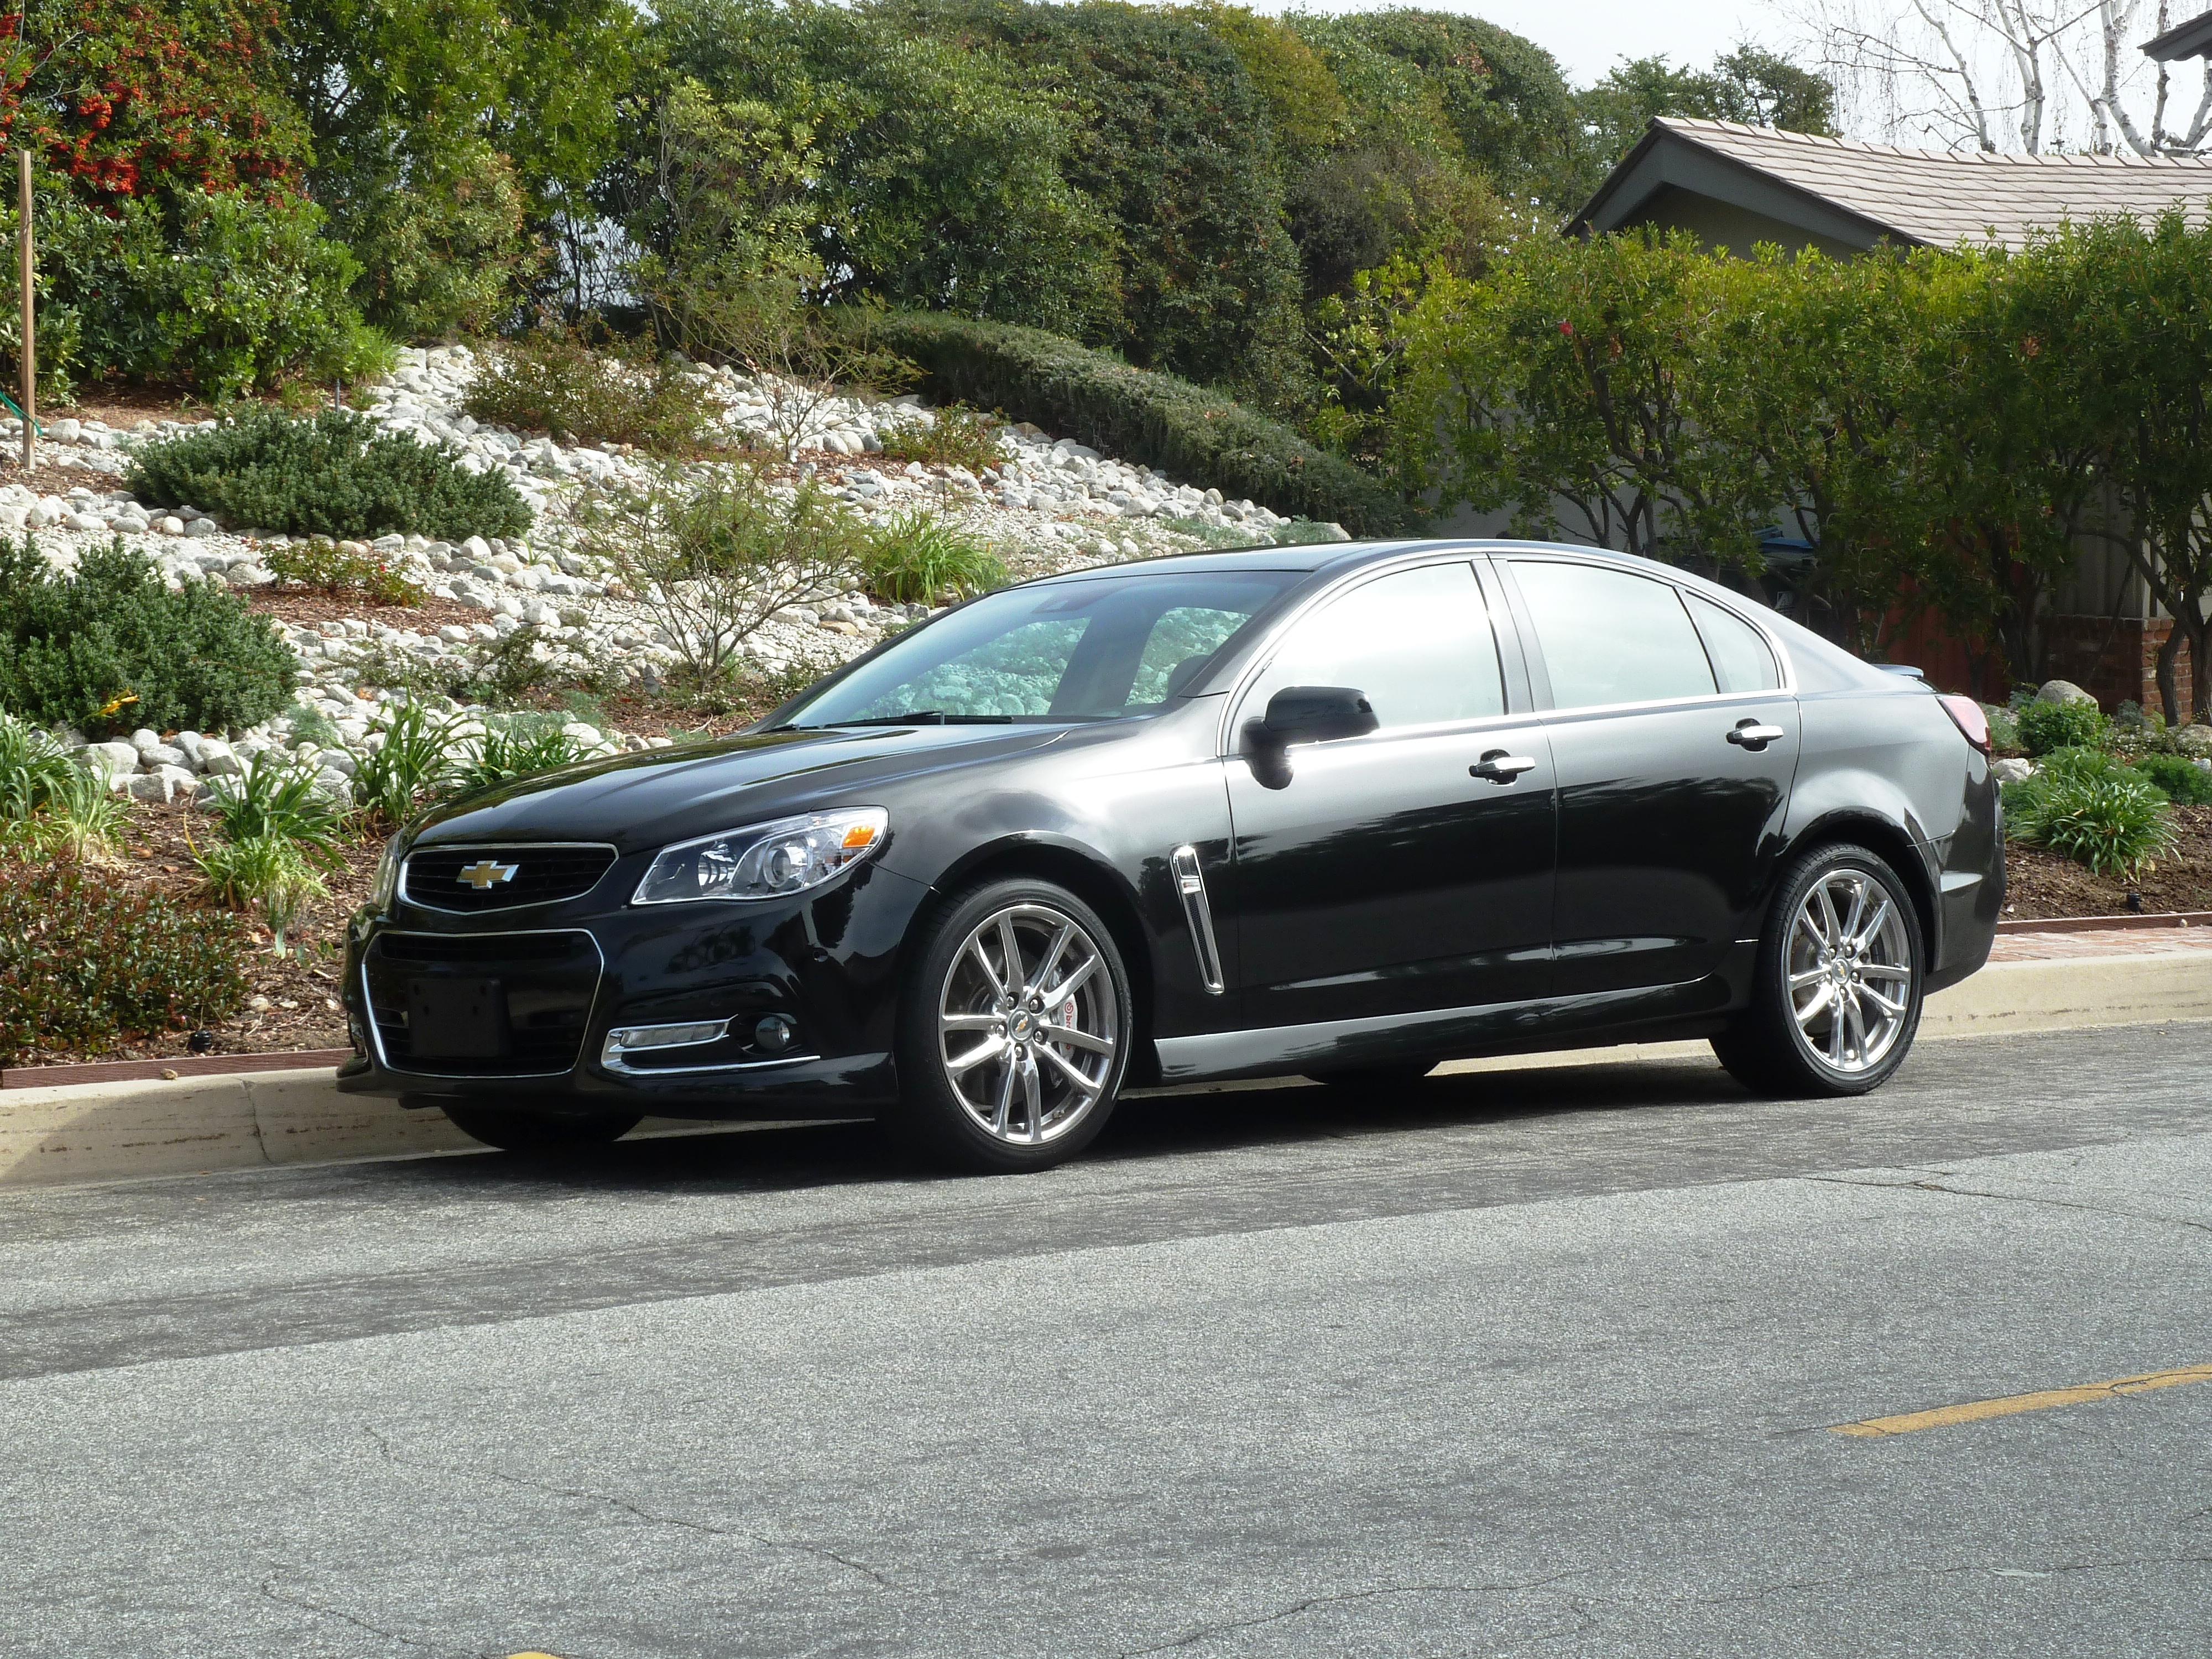 Driven: 2014 Chevrolet SS V-8